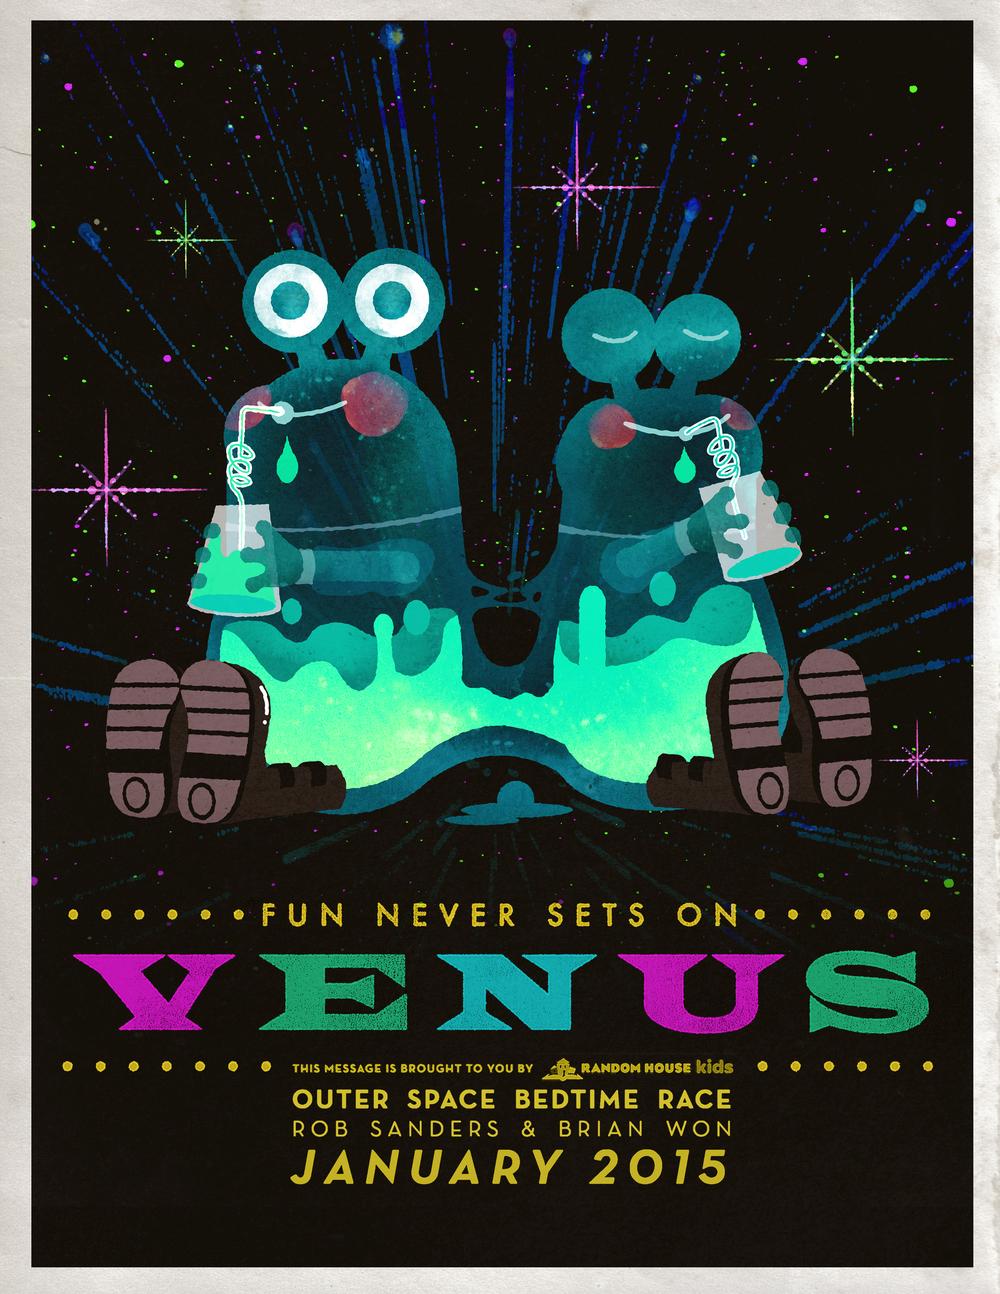 Venus Outer Space Bedtime Race.jpg